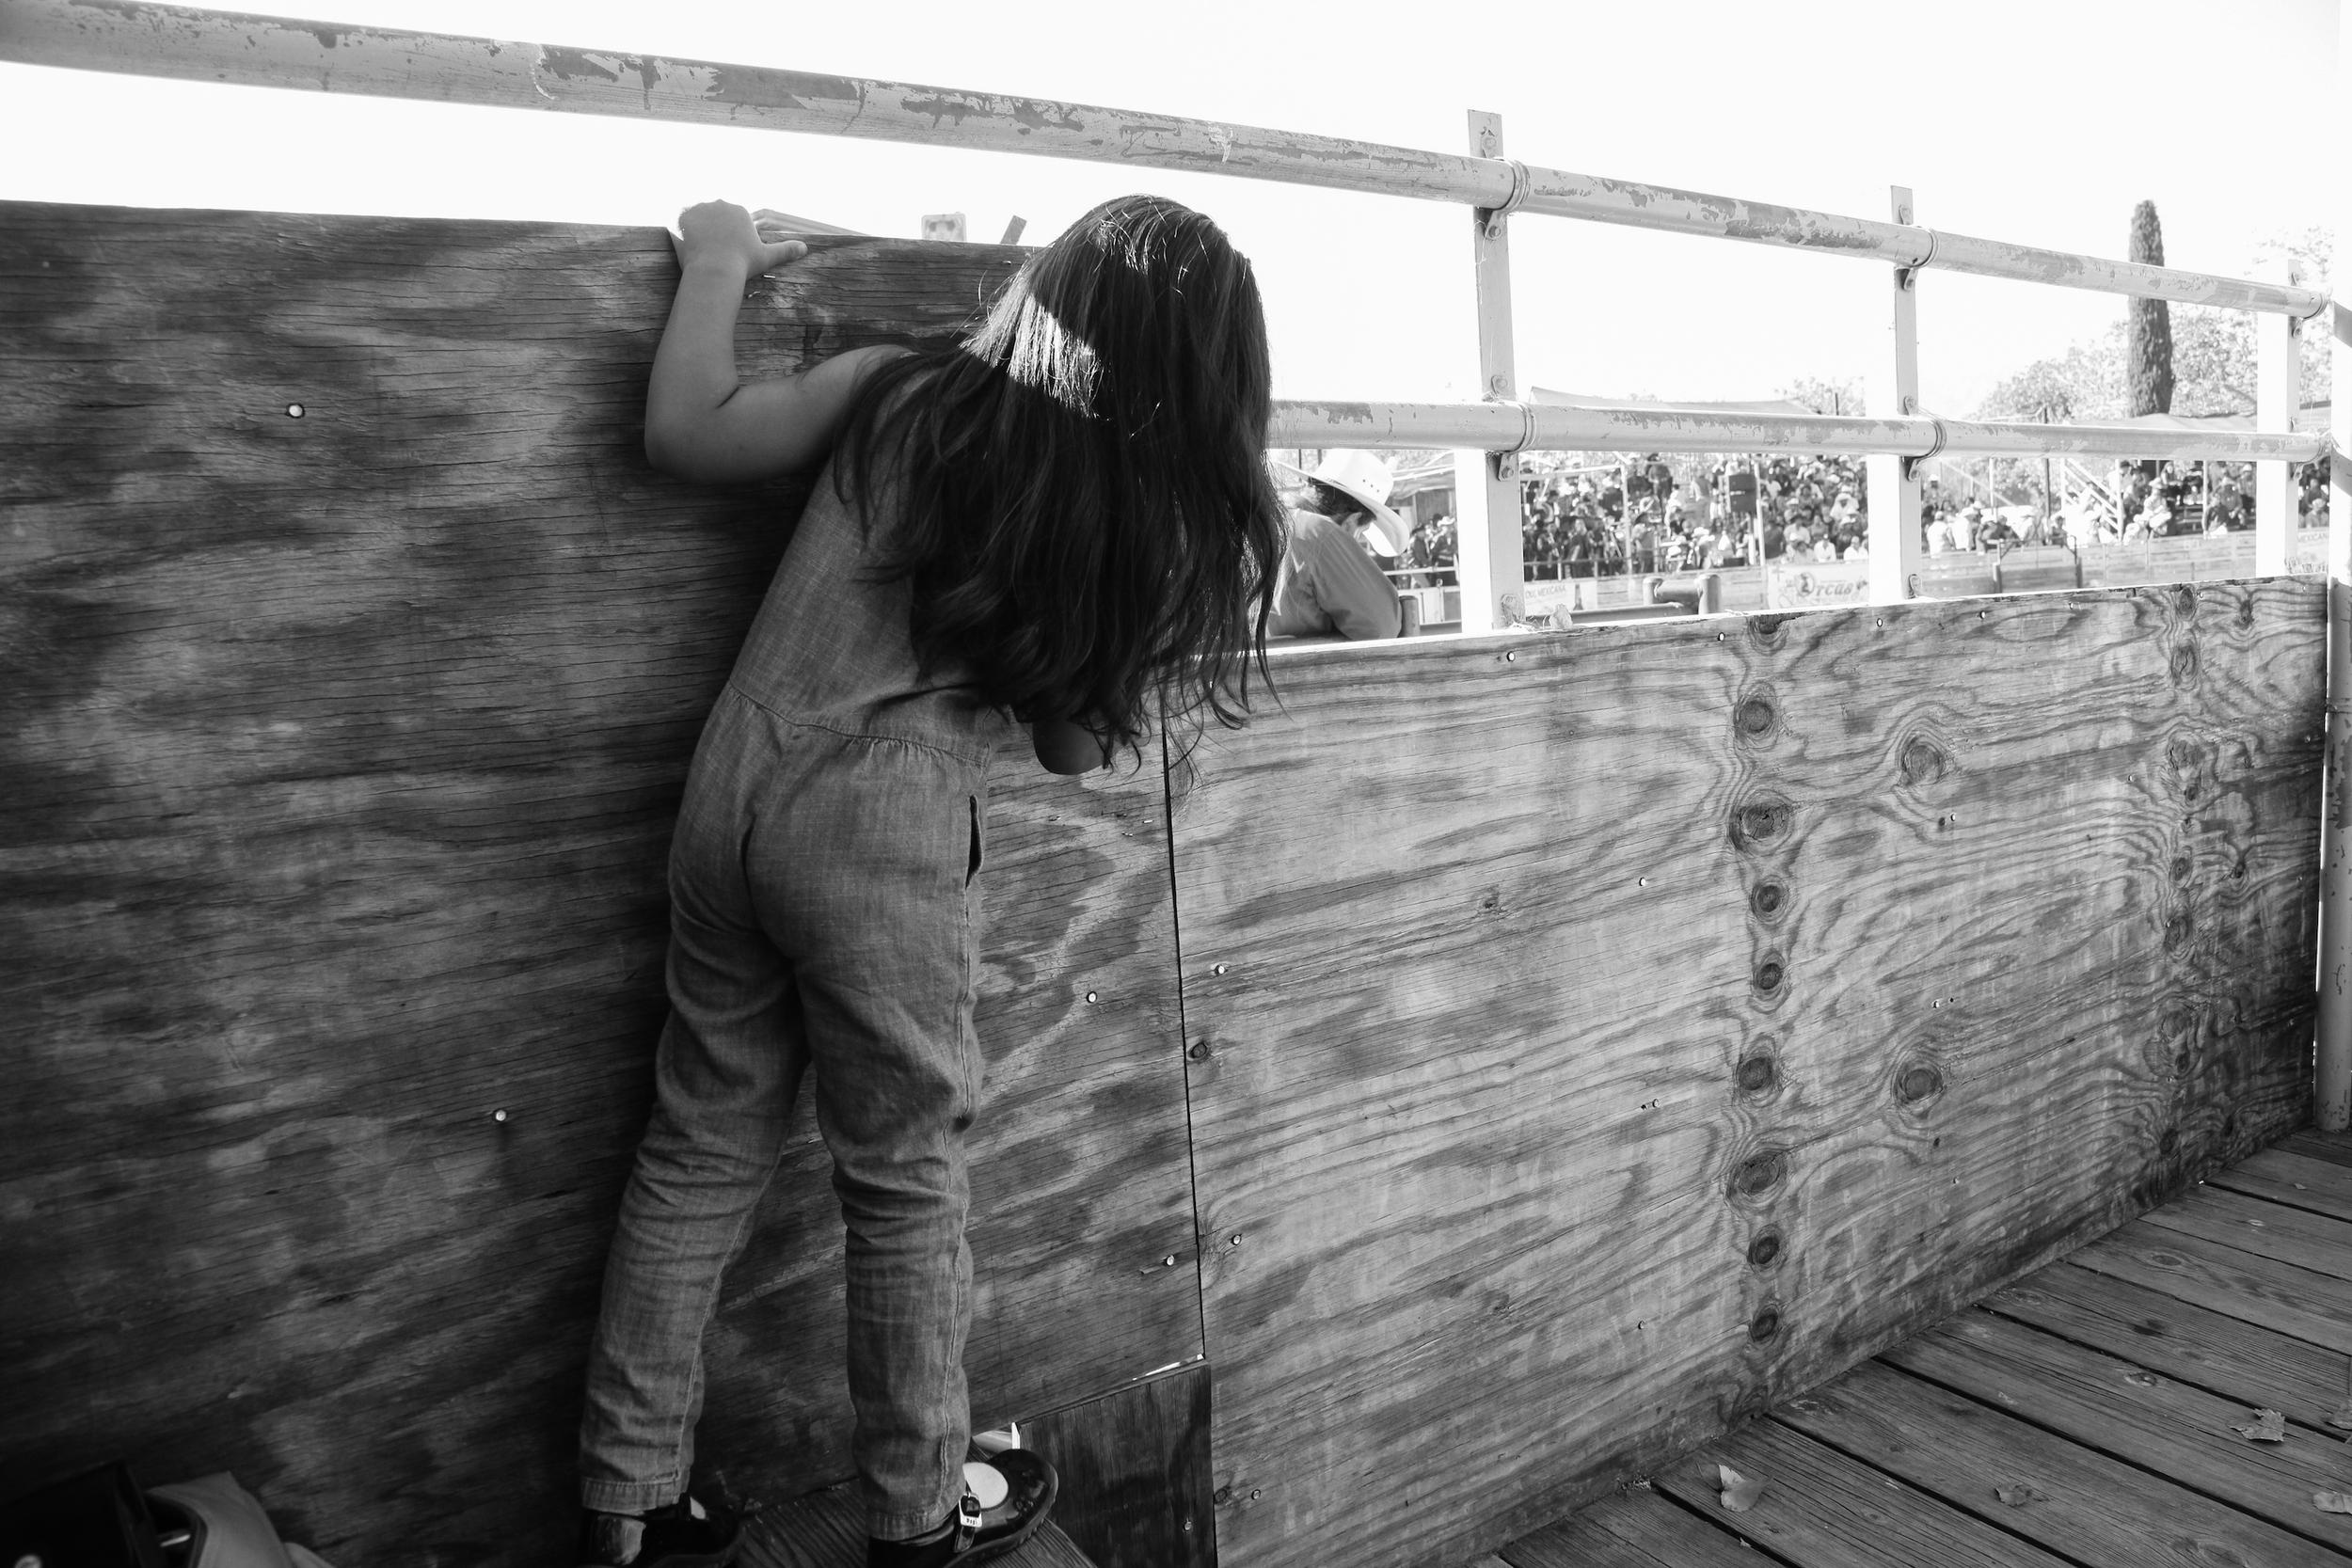 Rodeo | Diana Mantis